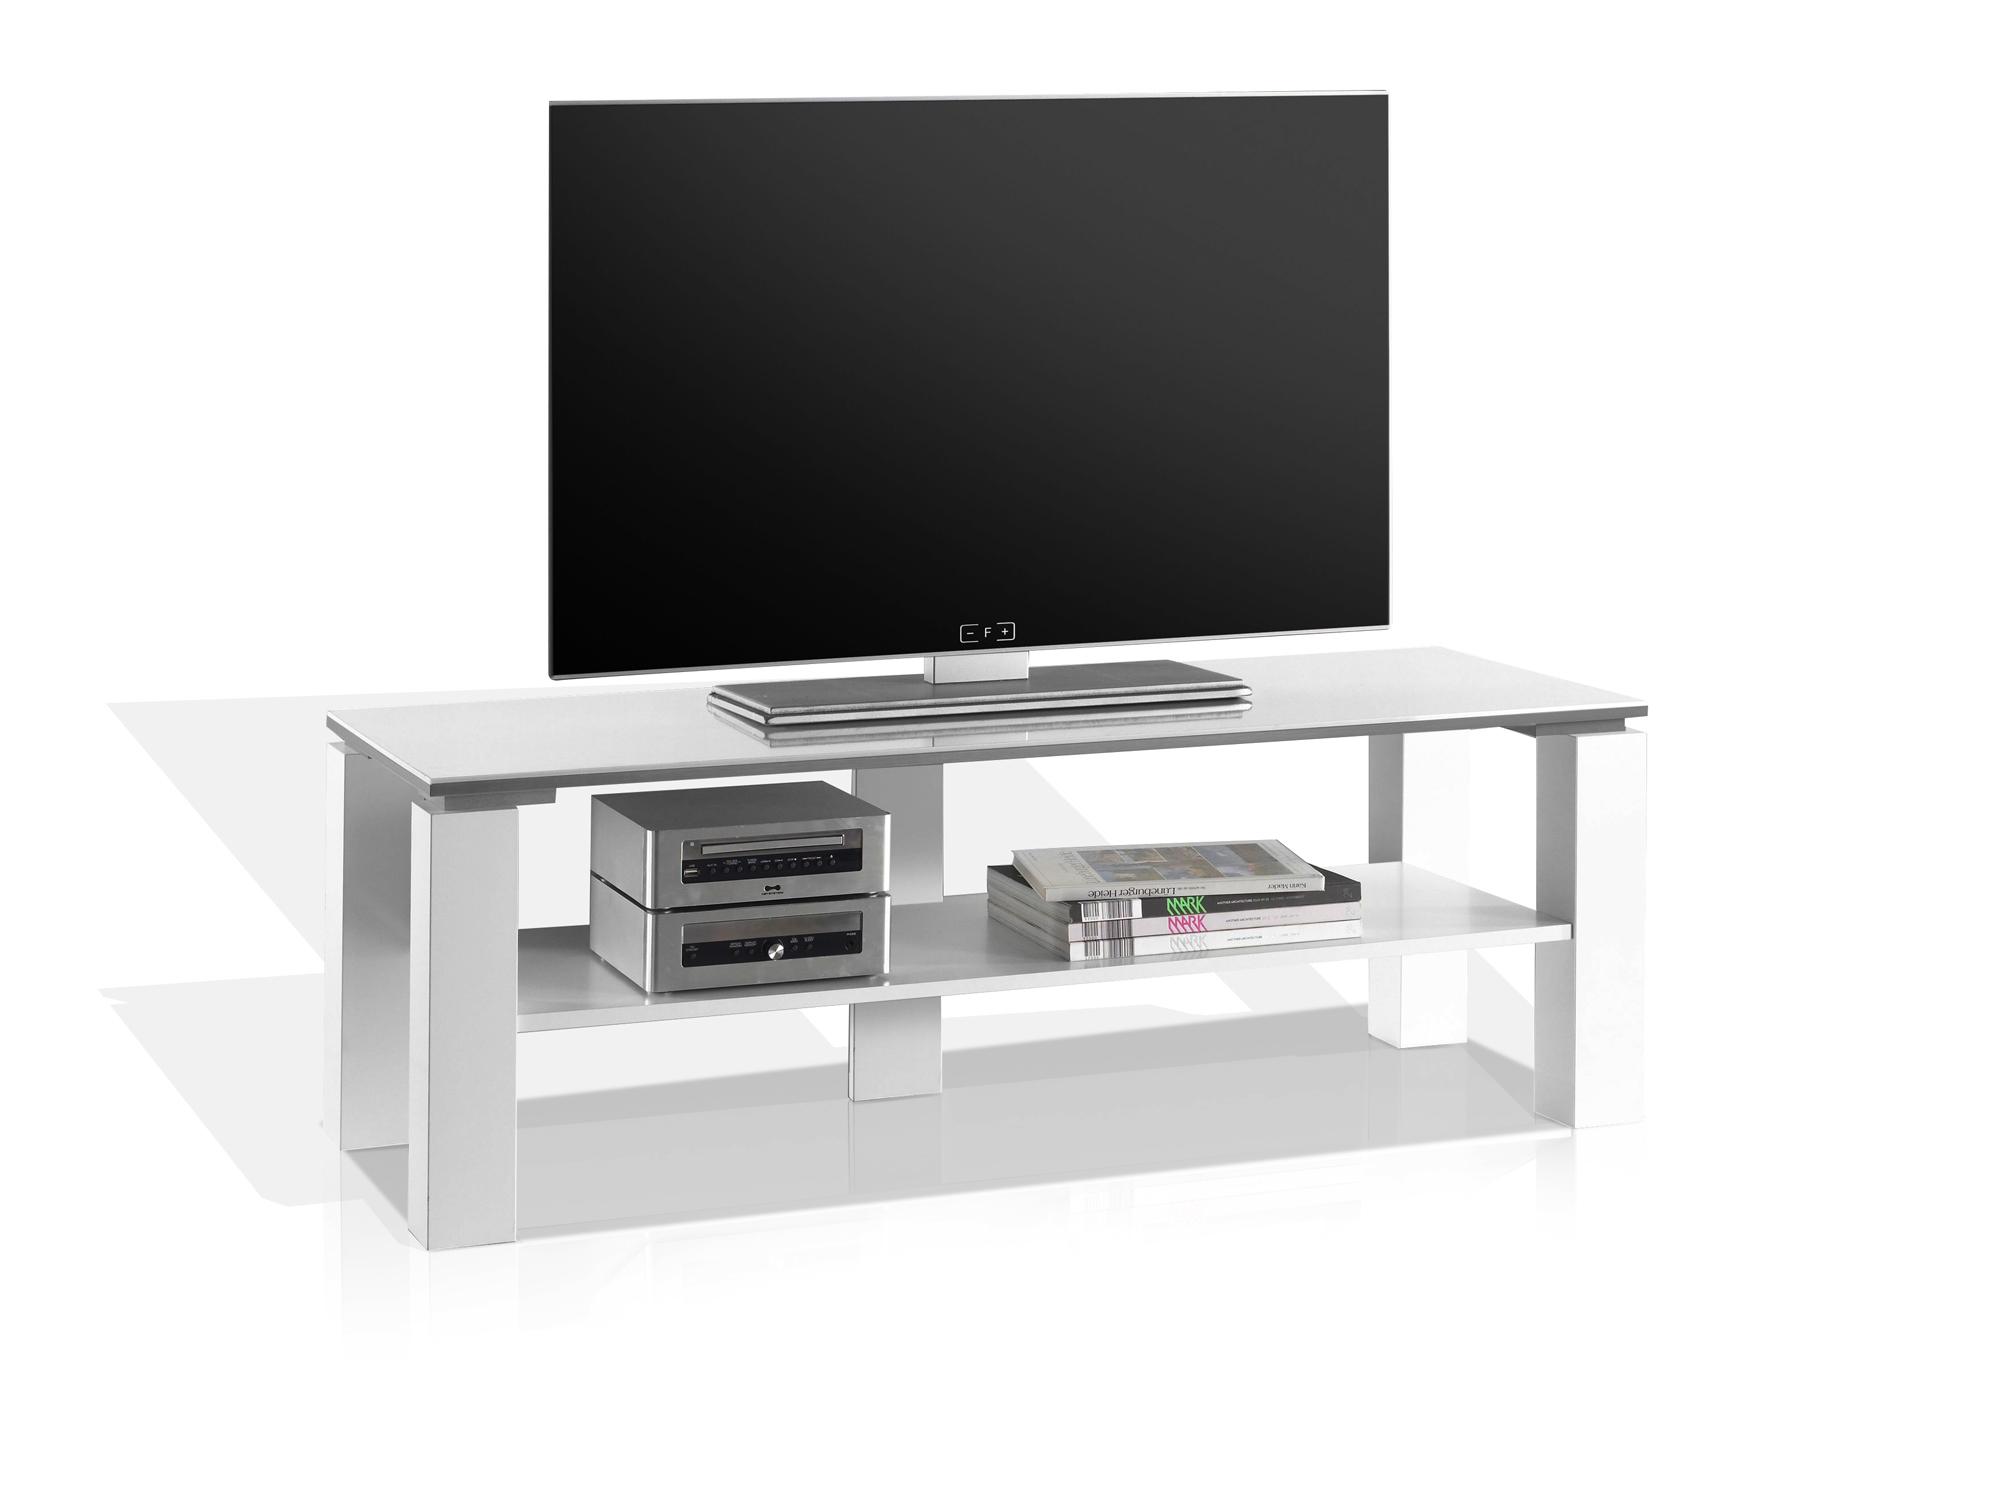 rabea lowboard 120 cm wei hochglanz. Black Bedroom Furniture Sets. Home Design Ideas